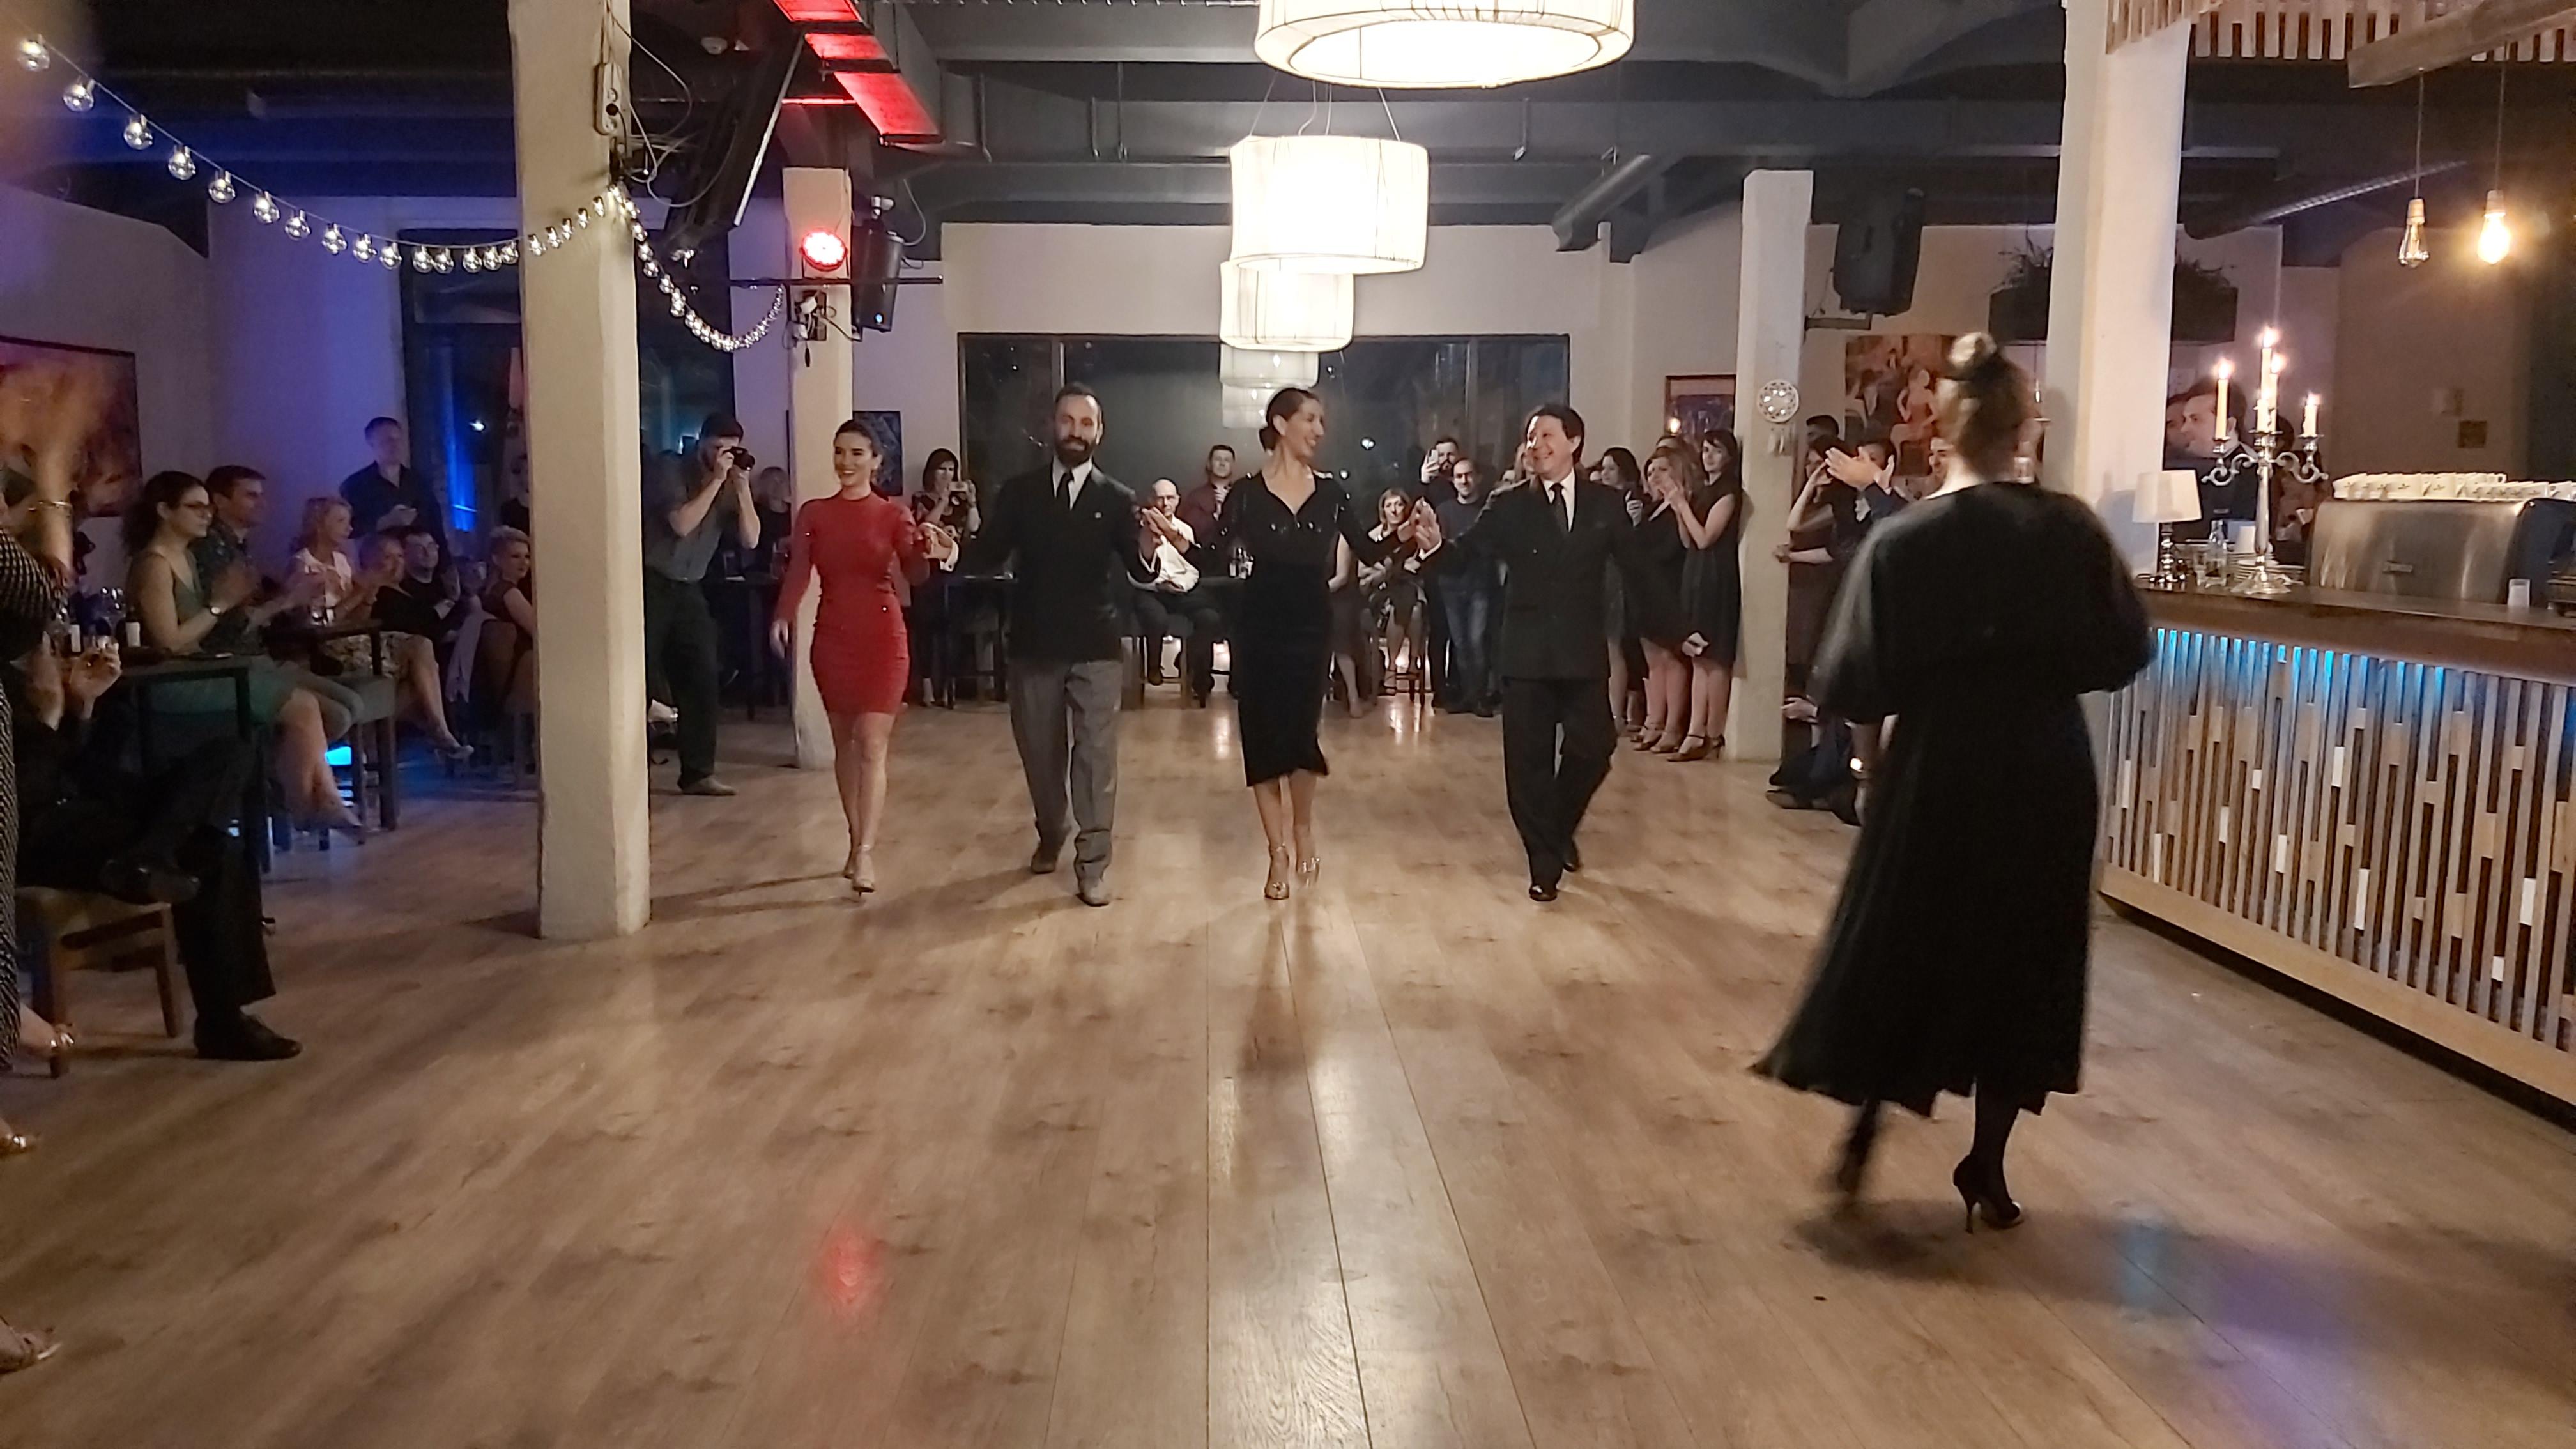 Udruga Tango Dubrovnik Tango Argentisnki Tango